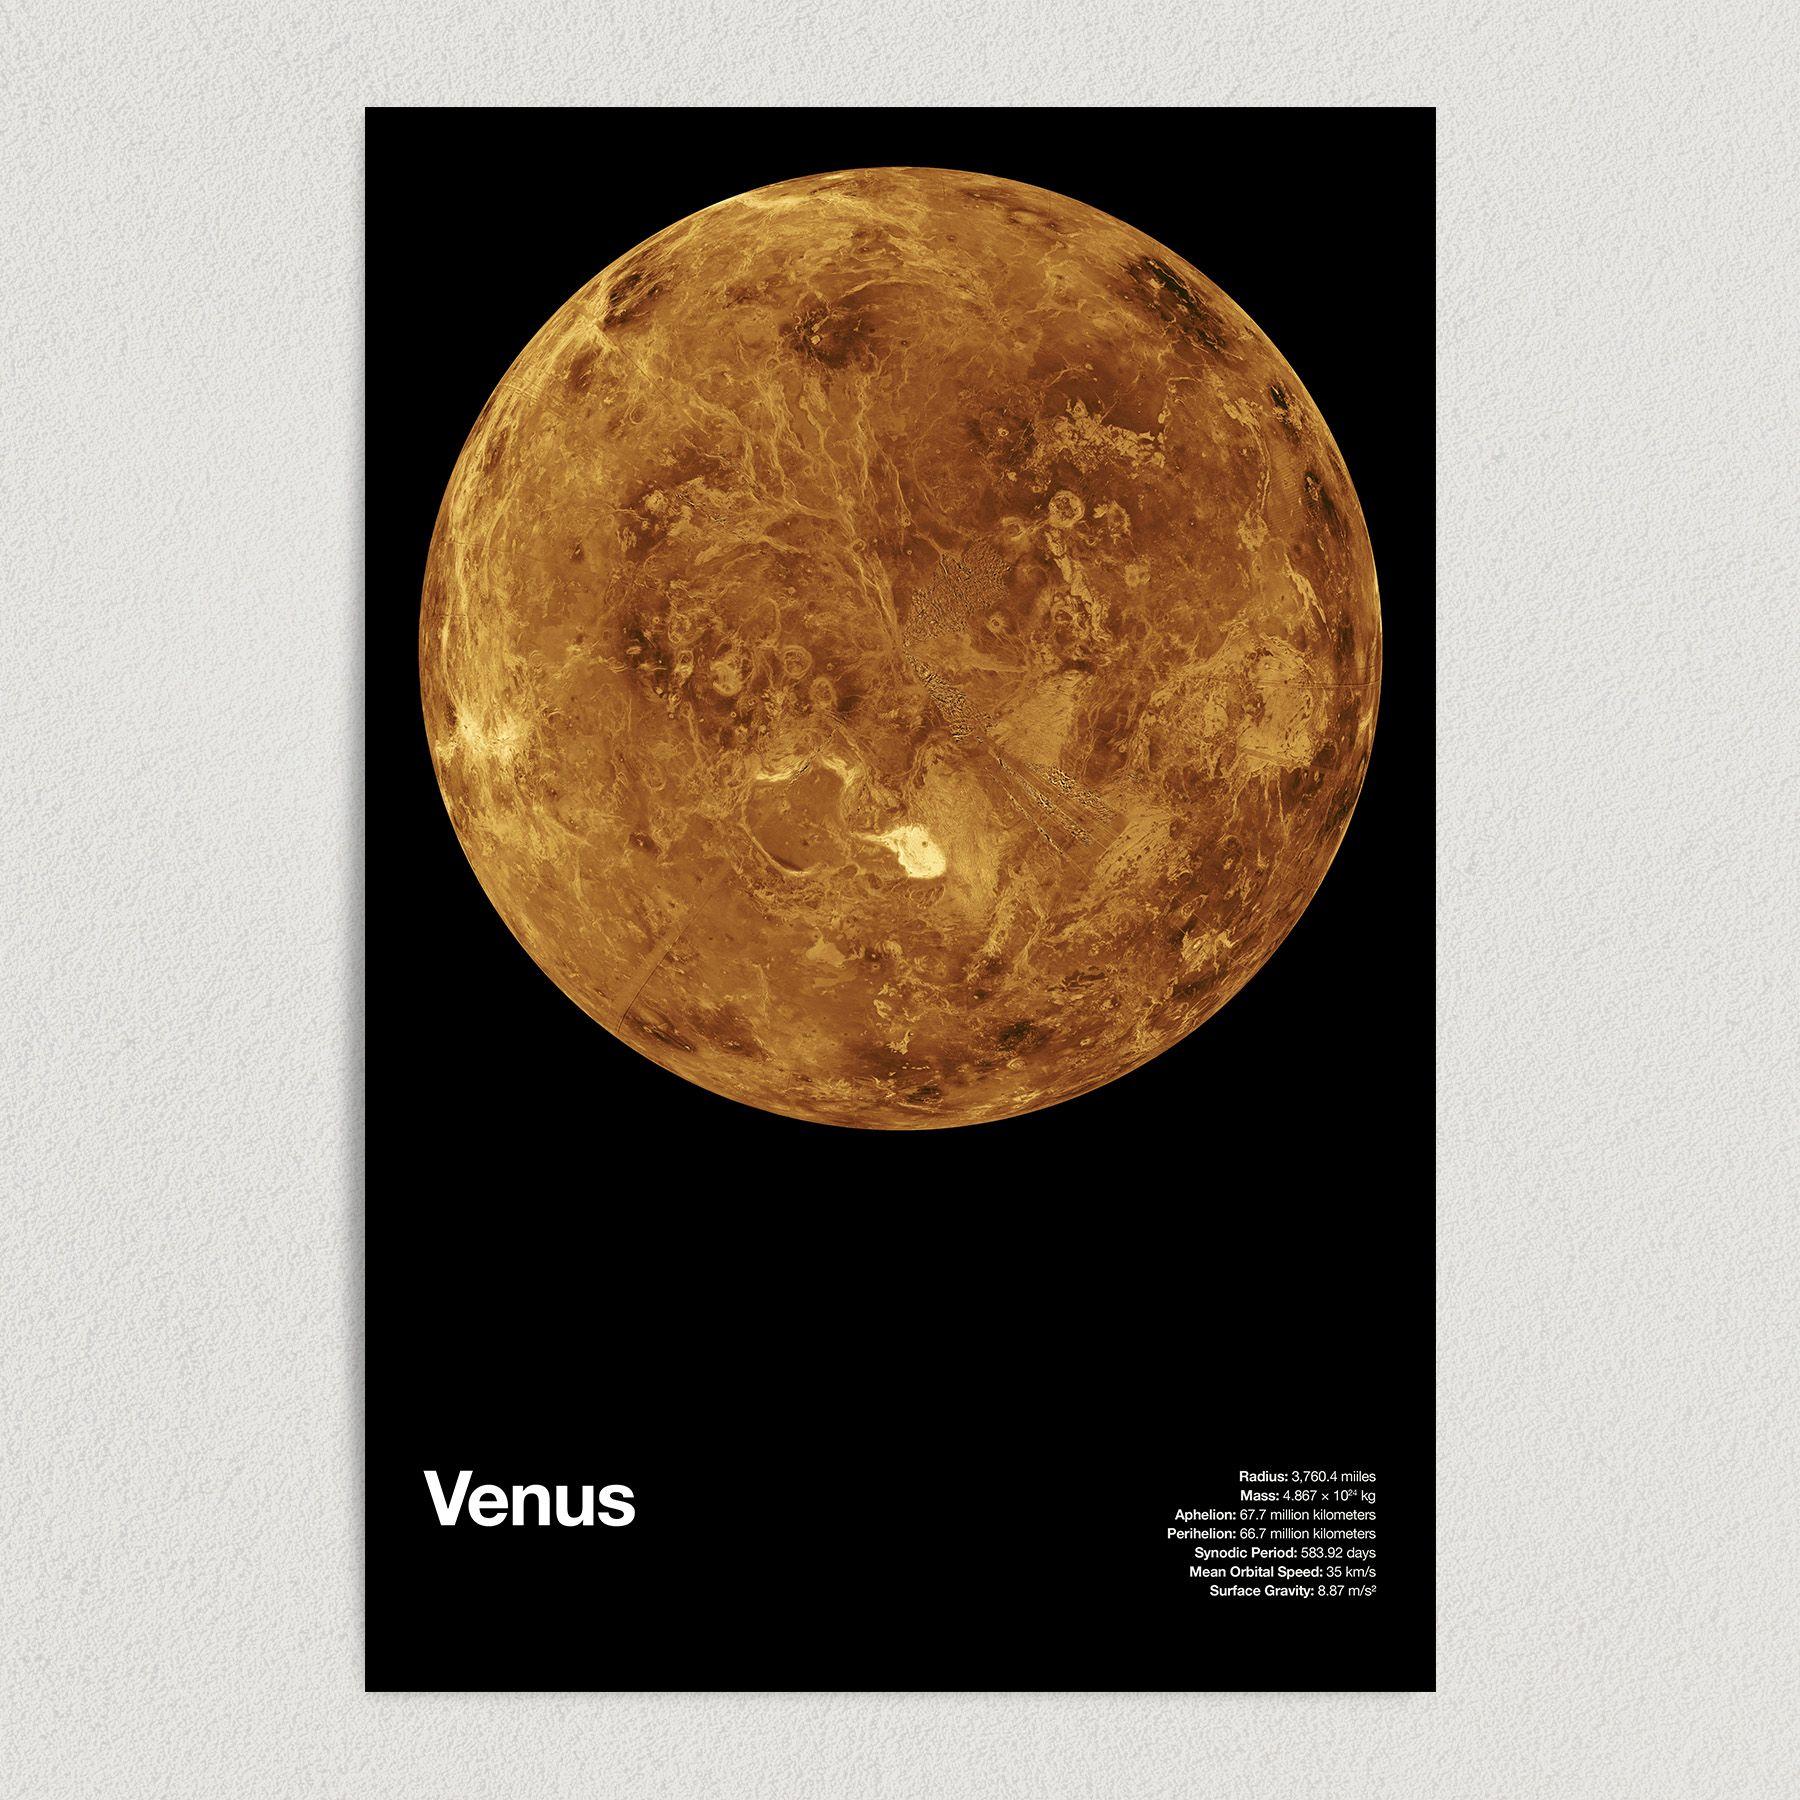 Planet Venus Astronomy Education Art Print Poster 12″ x 18″ Wall Art SS2159